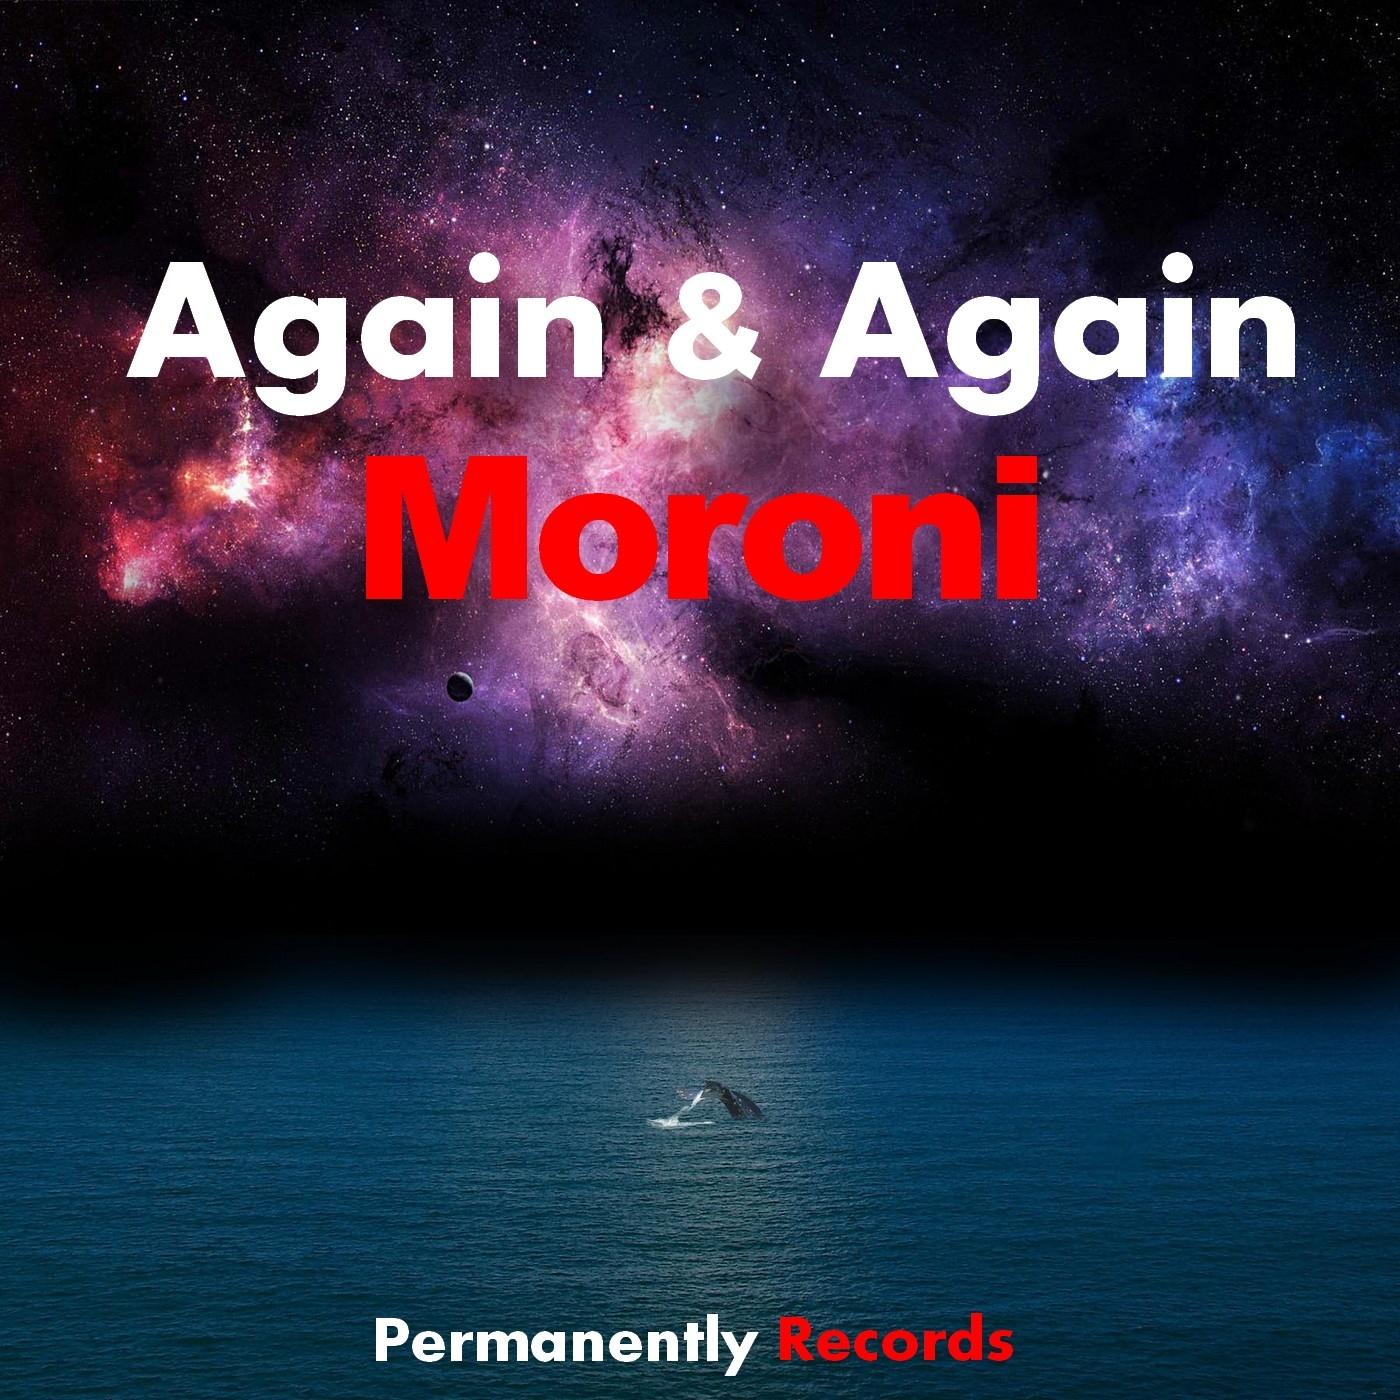 Moroni - Again & Again (Original mix)